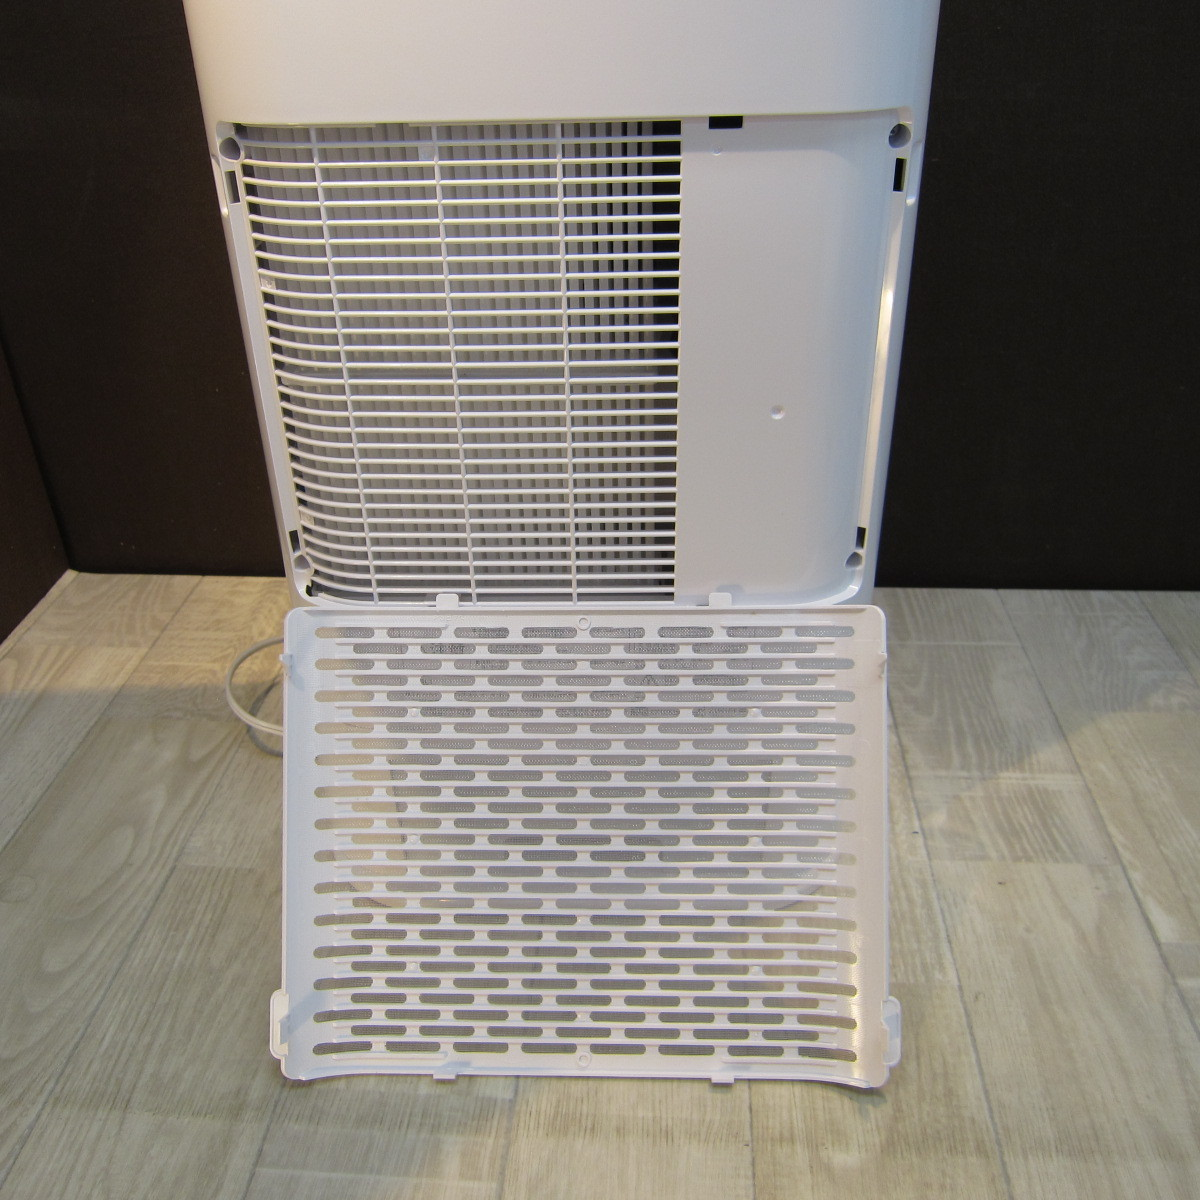 S6081【未使用】アイリスオーヤマ 衣類乾燥除湿機 スピード乾燥 サーキュレーター機能付 デシカント式 ホワイト IJD-I50_画像7